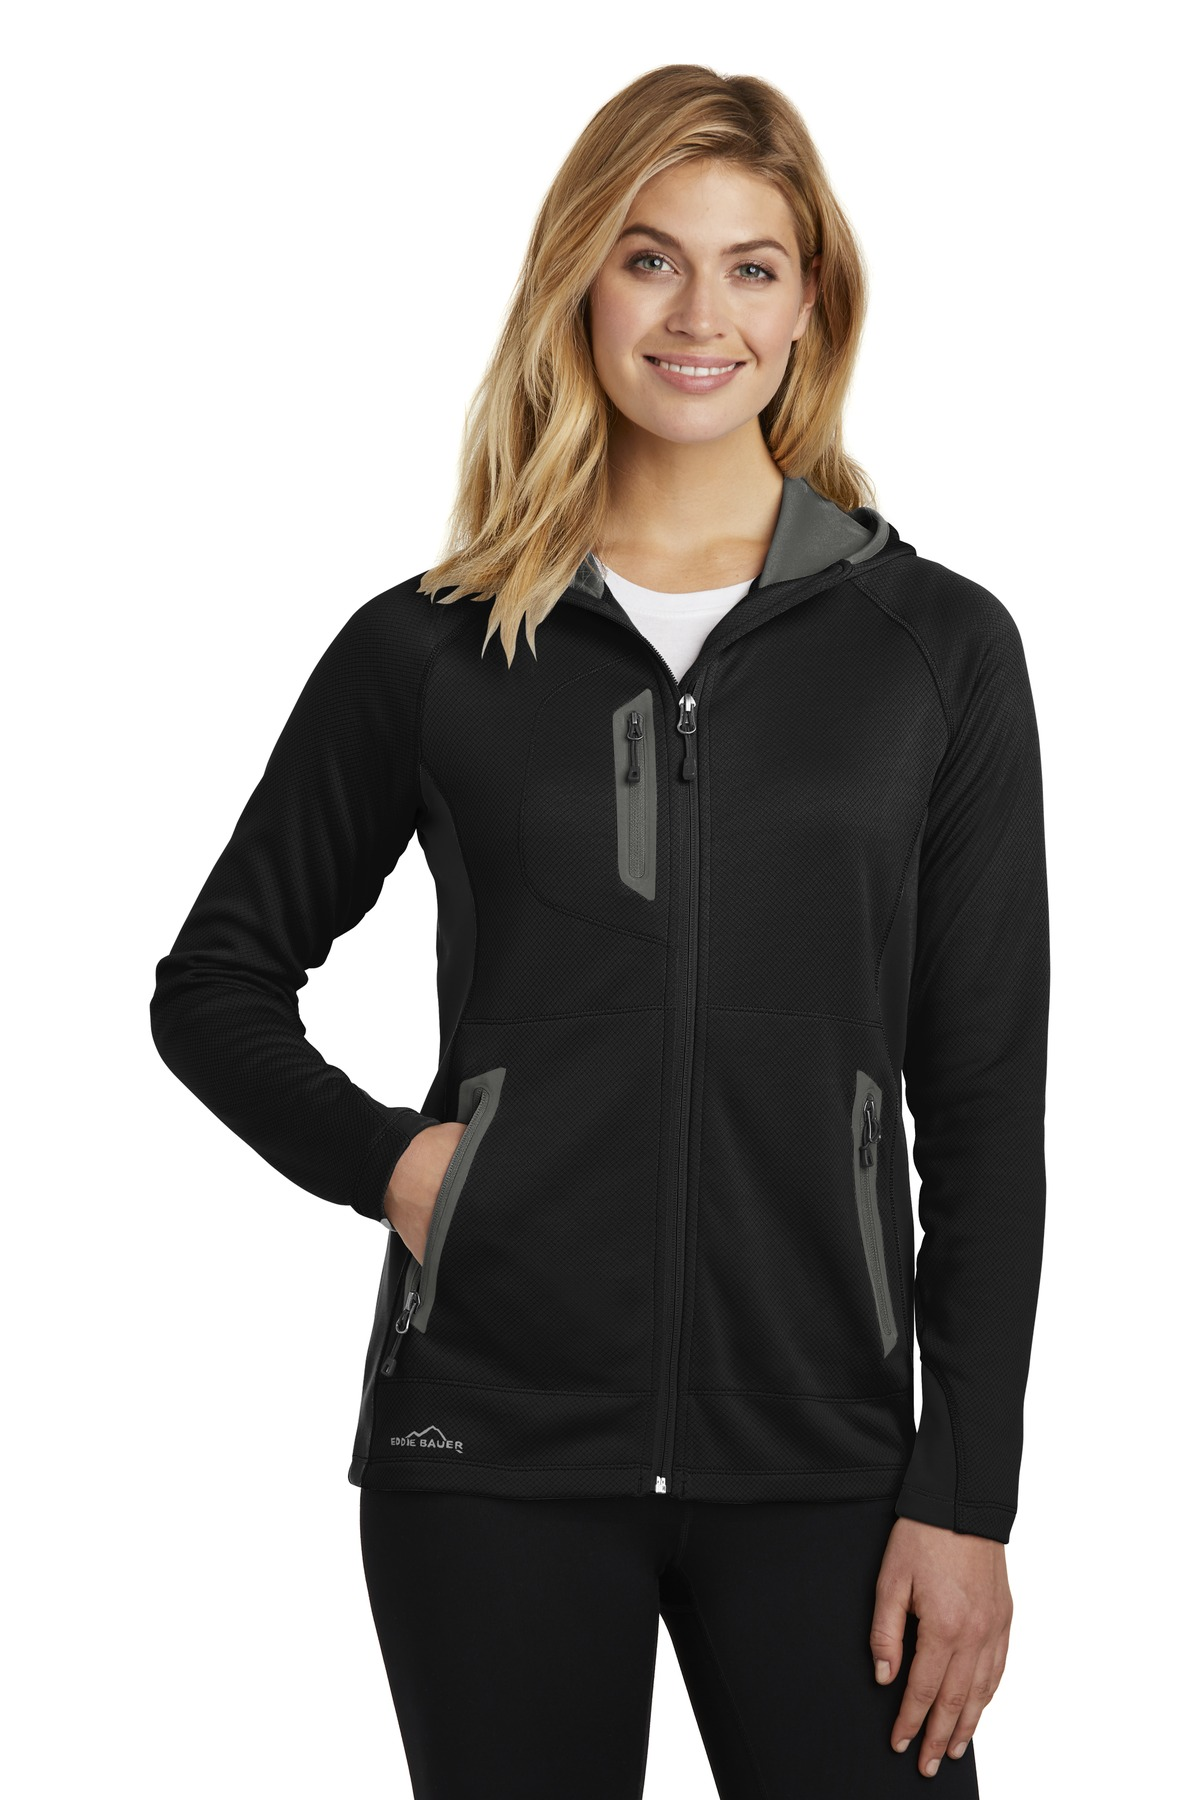 01f4c9da3d0 ... Eddie Bauer ® Ladies Sport Hooded Full-Zip Fleece Jacket. EB245.  Previous  Next